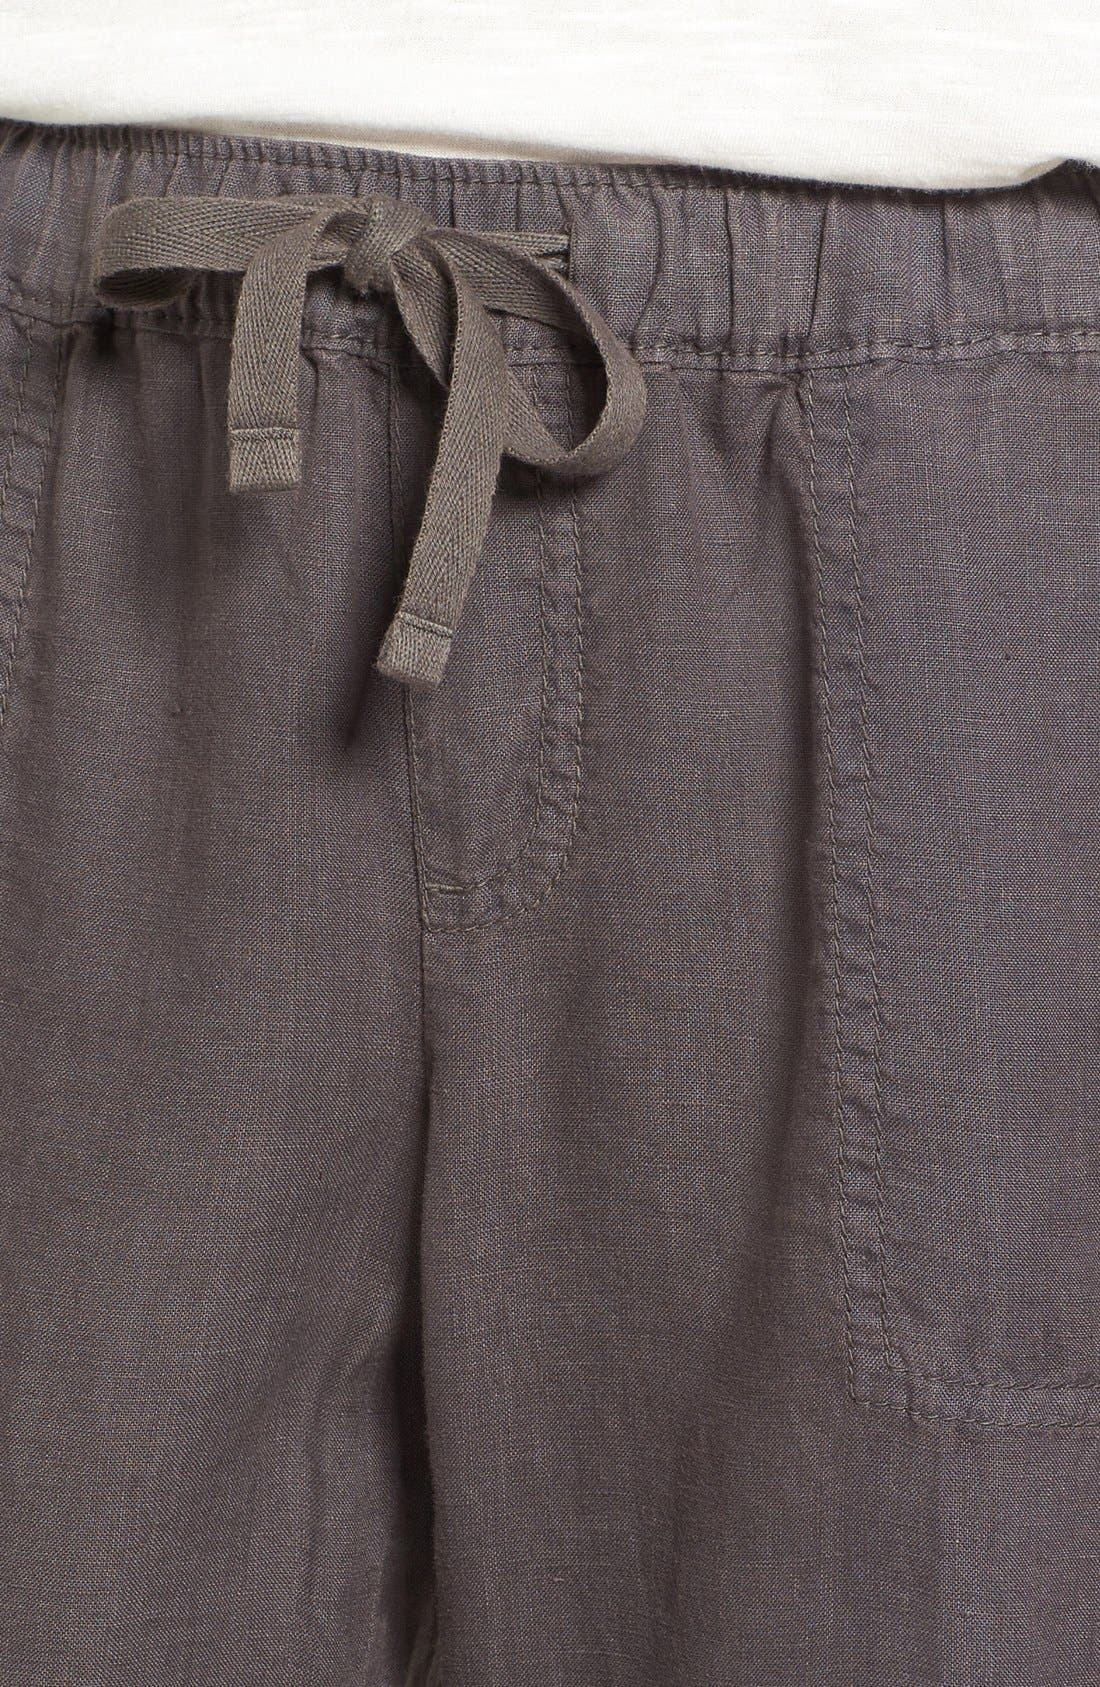 Crop Linen Joggers,                             Alternate thumbnail 3, color,                             Grey Ebony